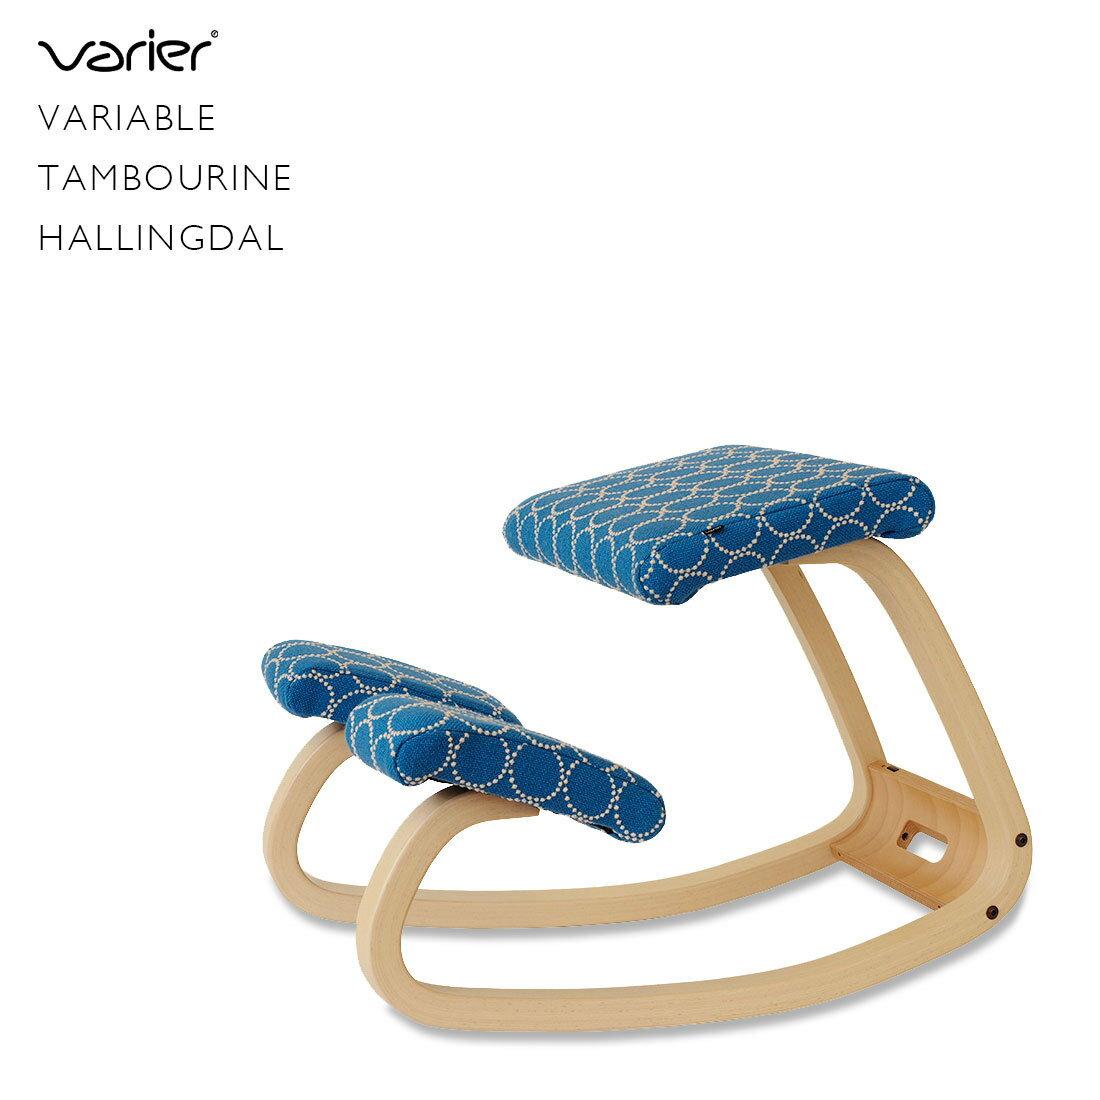 Varier ヴァリエール VARIABLE TAMBOURINE HALLINGDAL バリアブル / タンバリン / ハリンダルイス / 椅子 / chair / 限定品 / ピーター・オプスヴィック